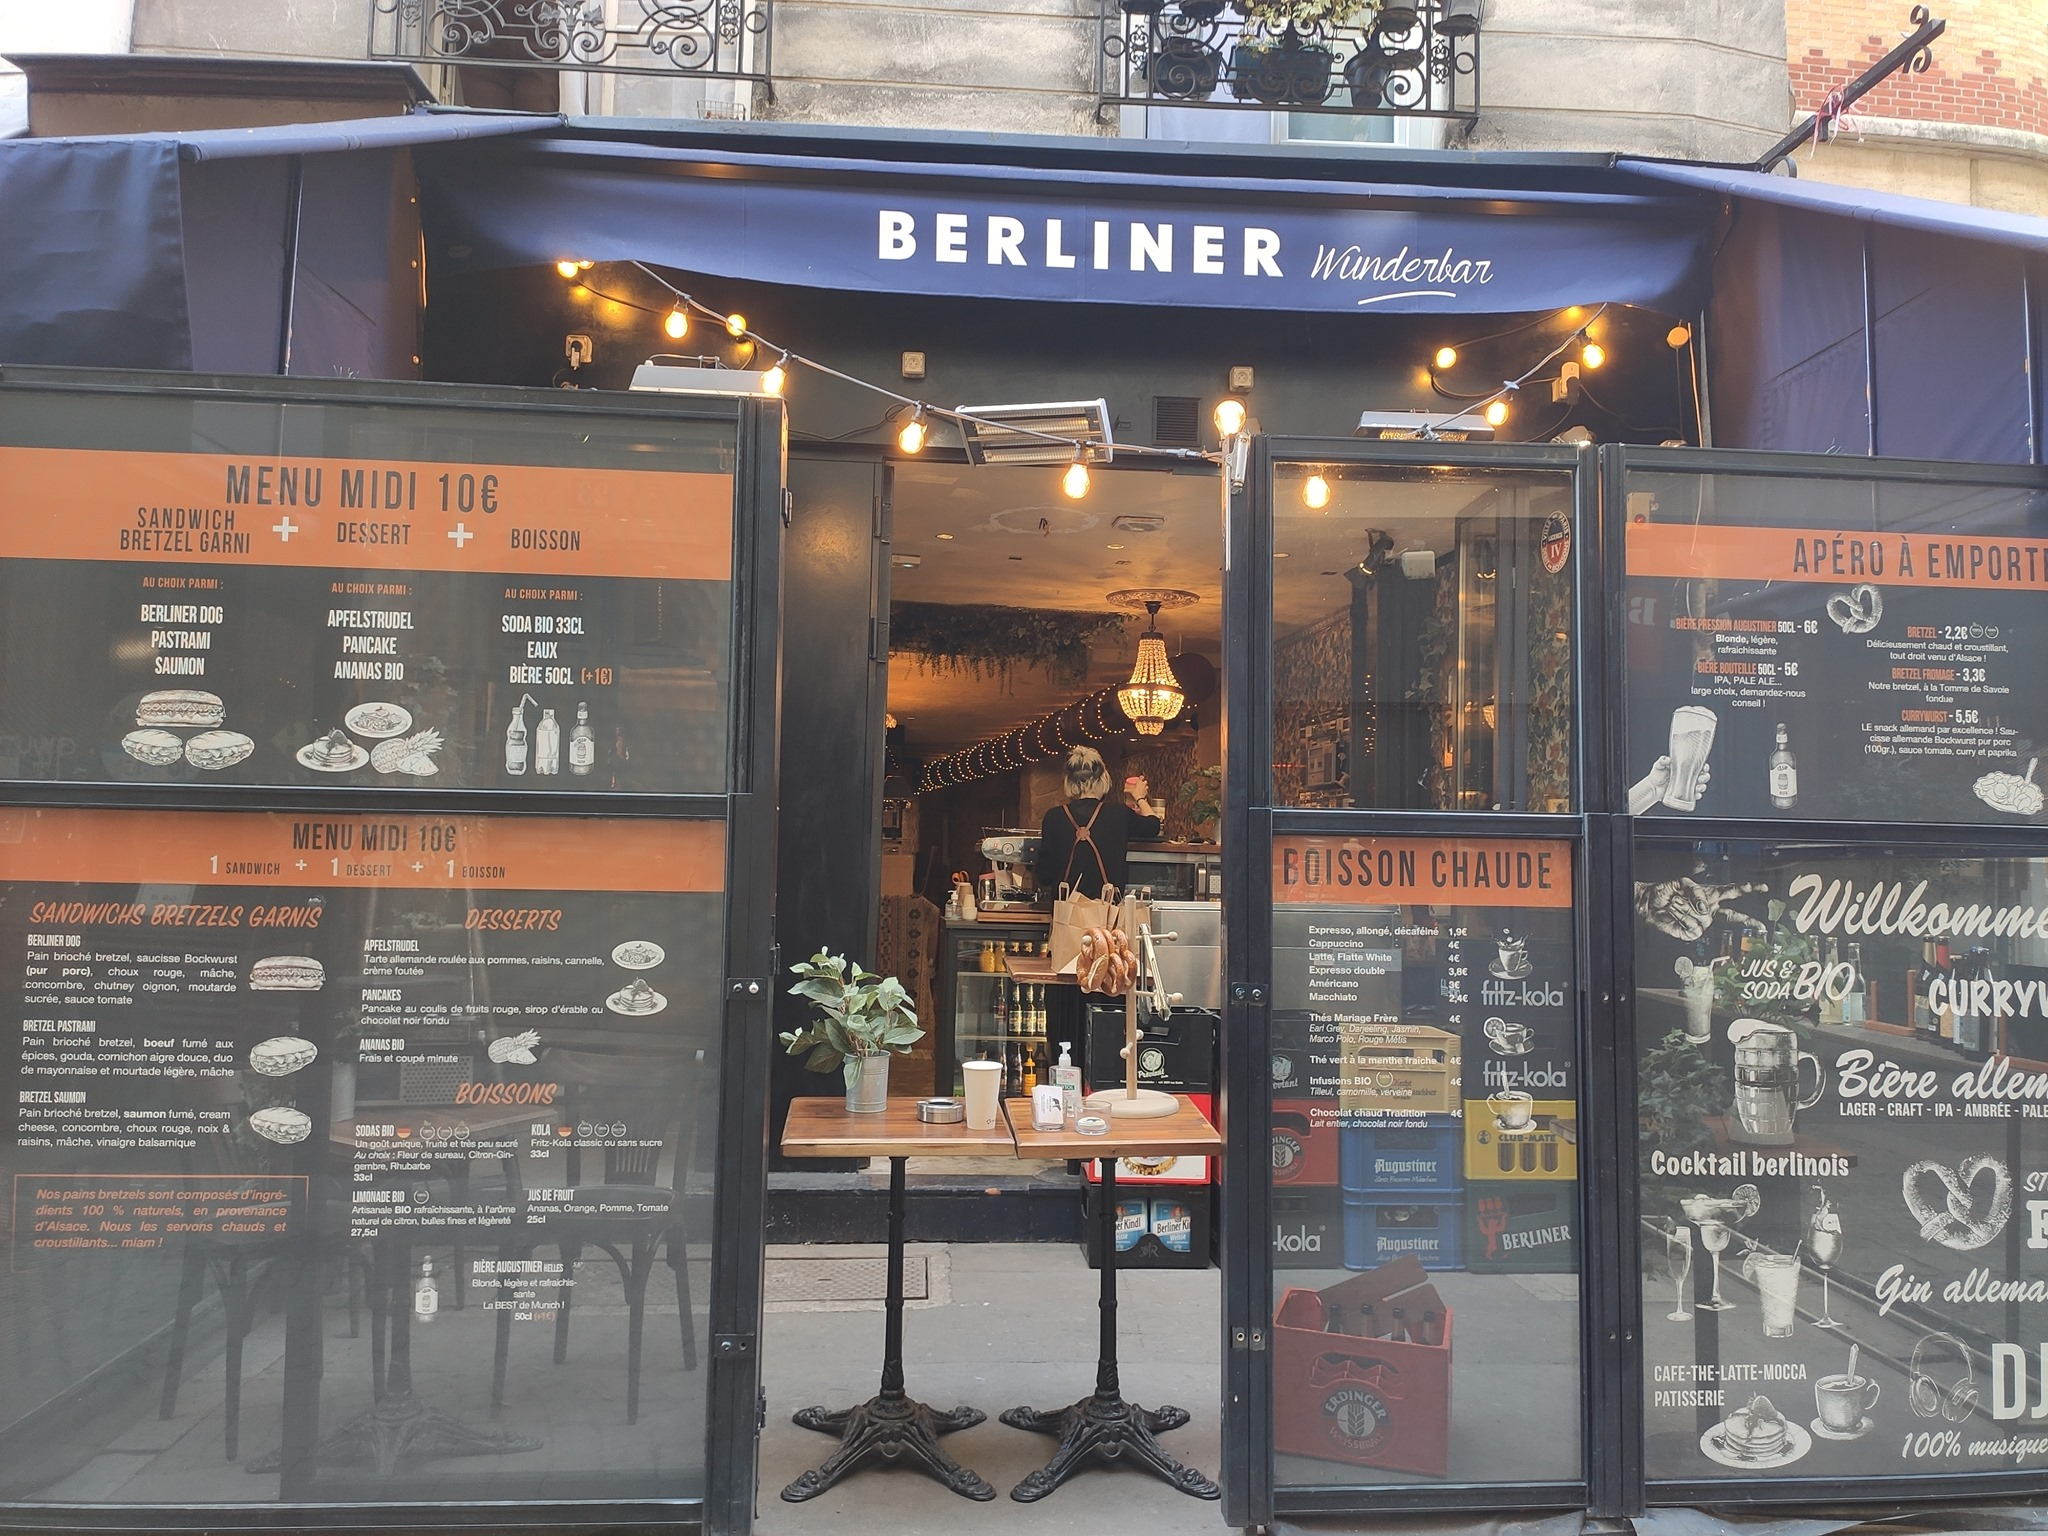 Berliner Wunderbar Châtelet - Paris - Take away